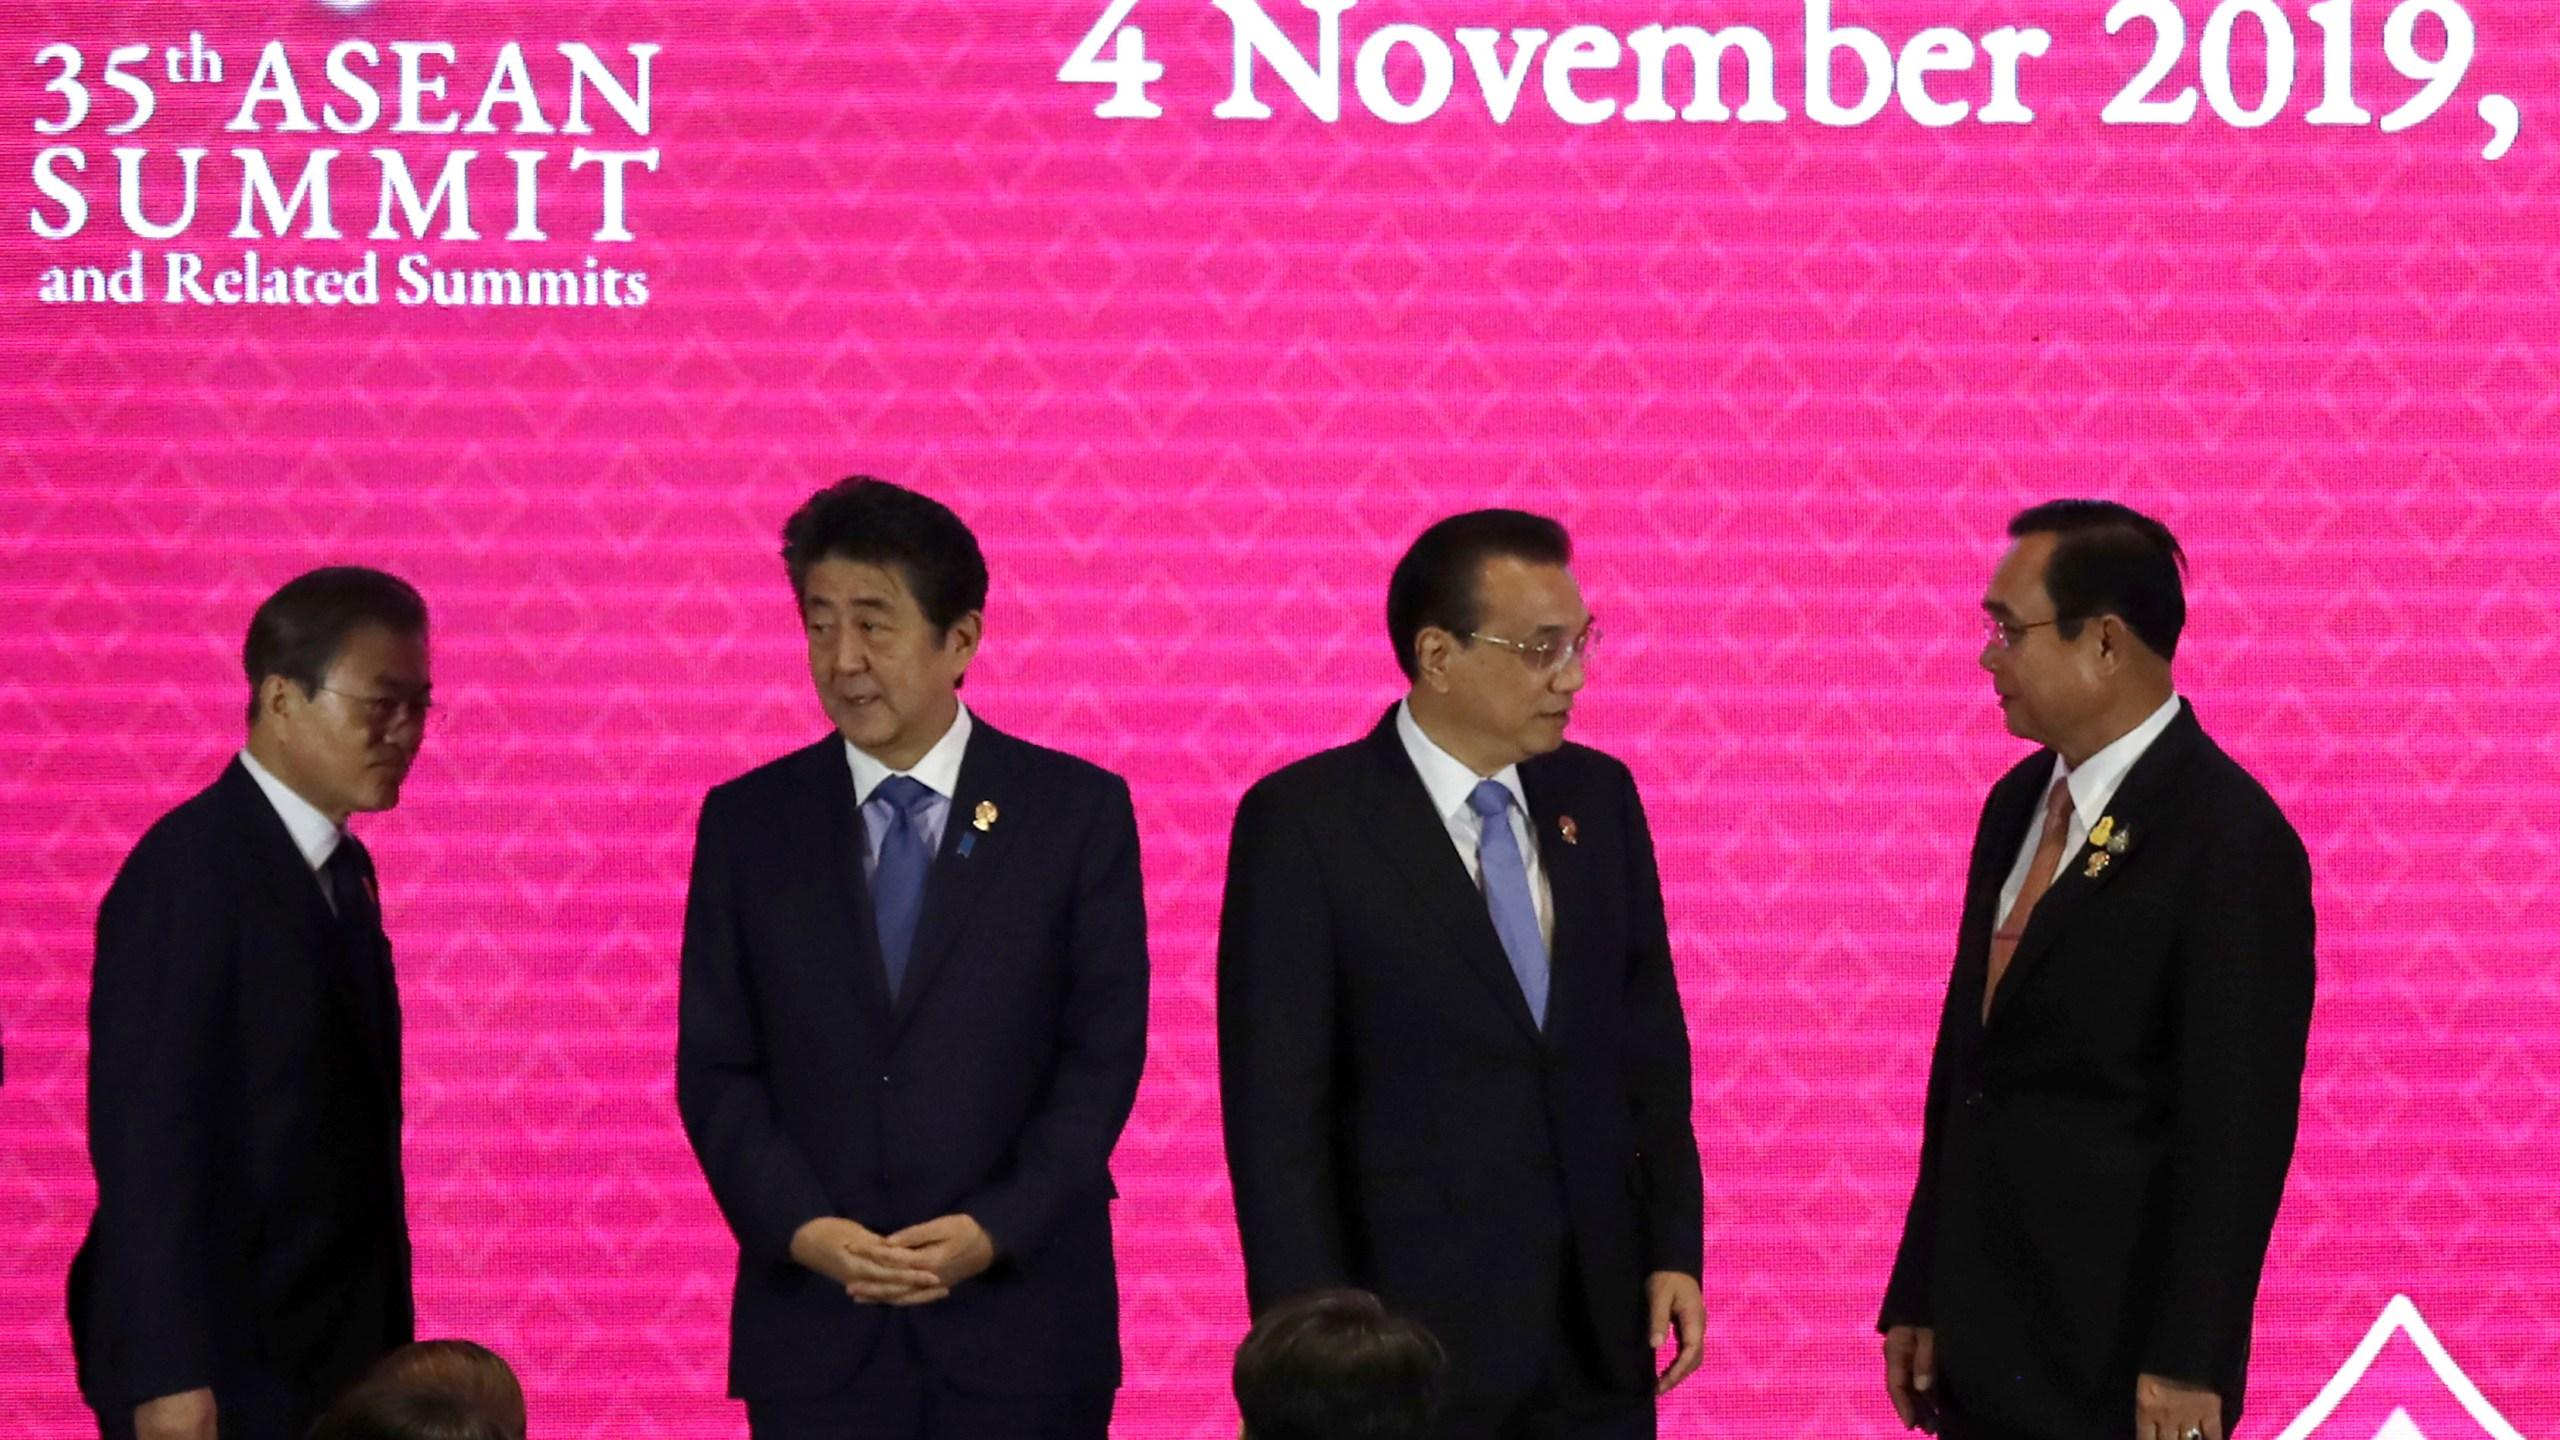 Moon Jae-in, Shinzo Abe, Li Keqiang, Prayuth Chan-ocha